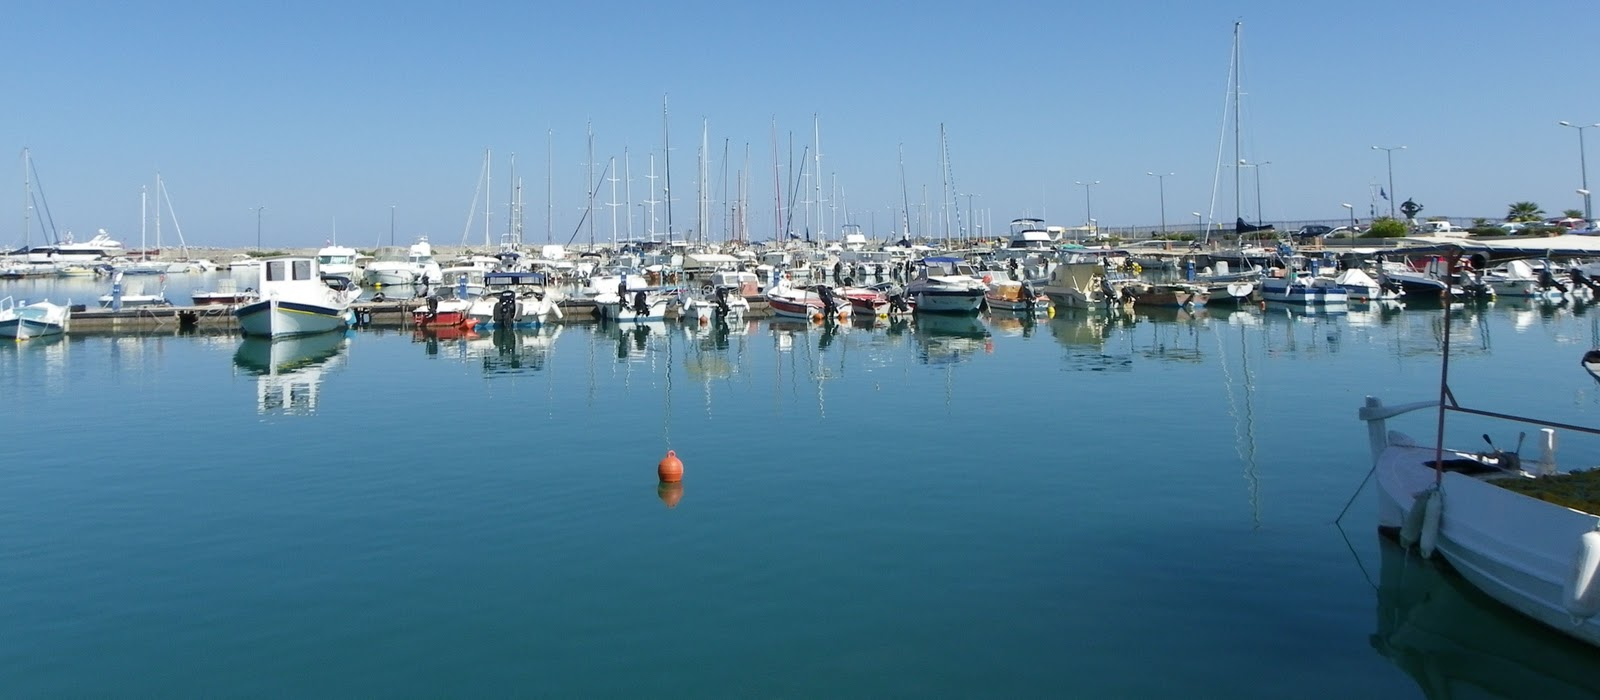 Future cr toise en bord de mer rethymnon - Port barcares meteo 7 jours ...